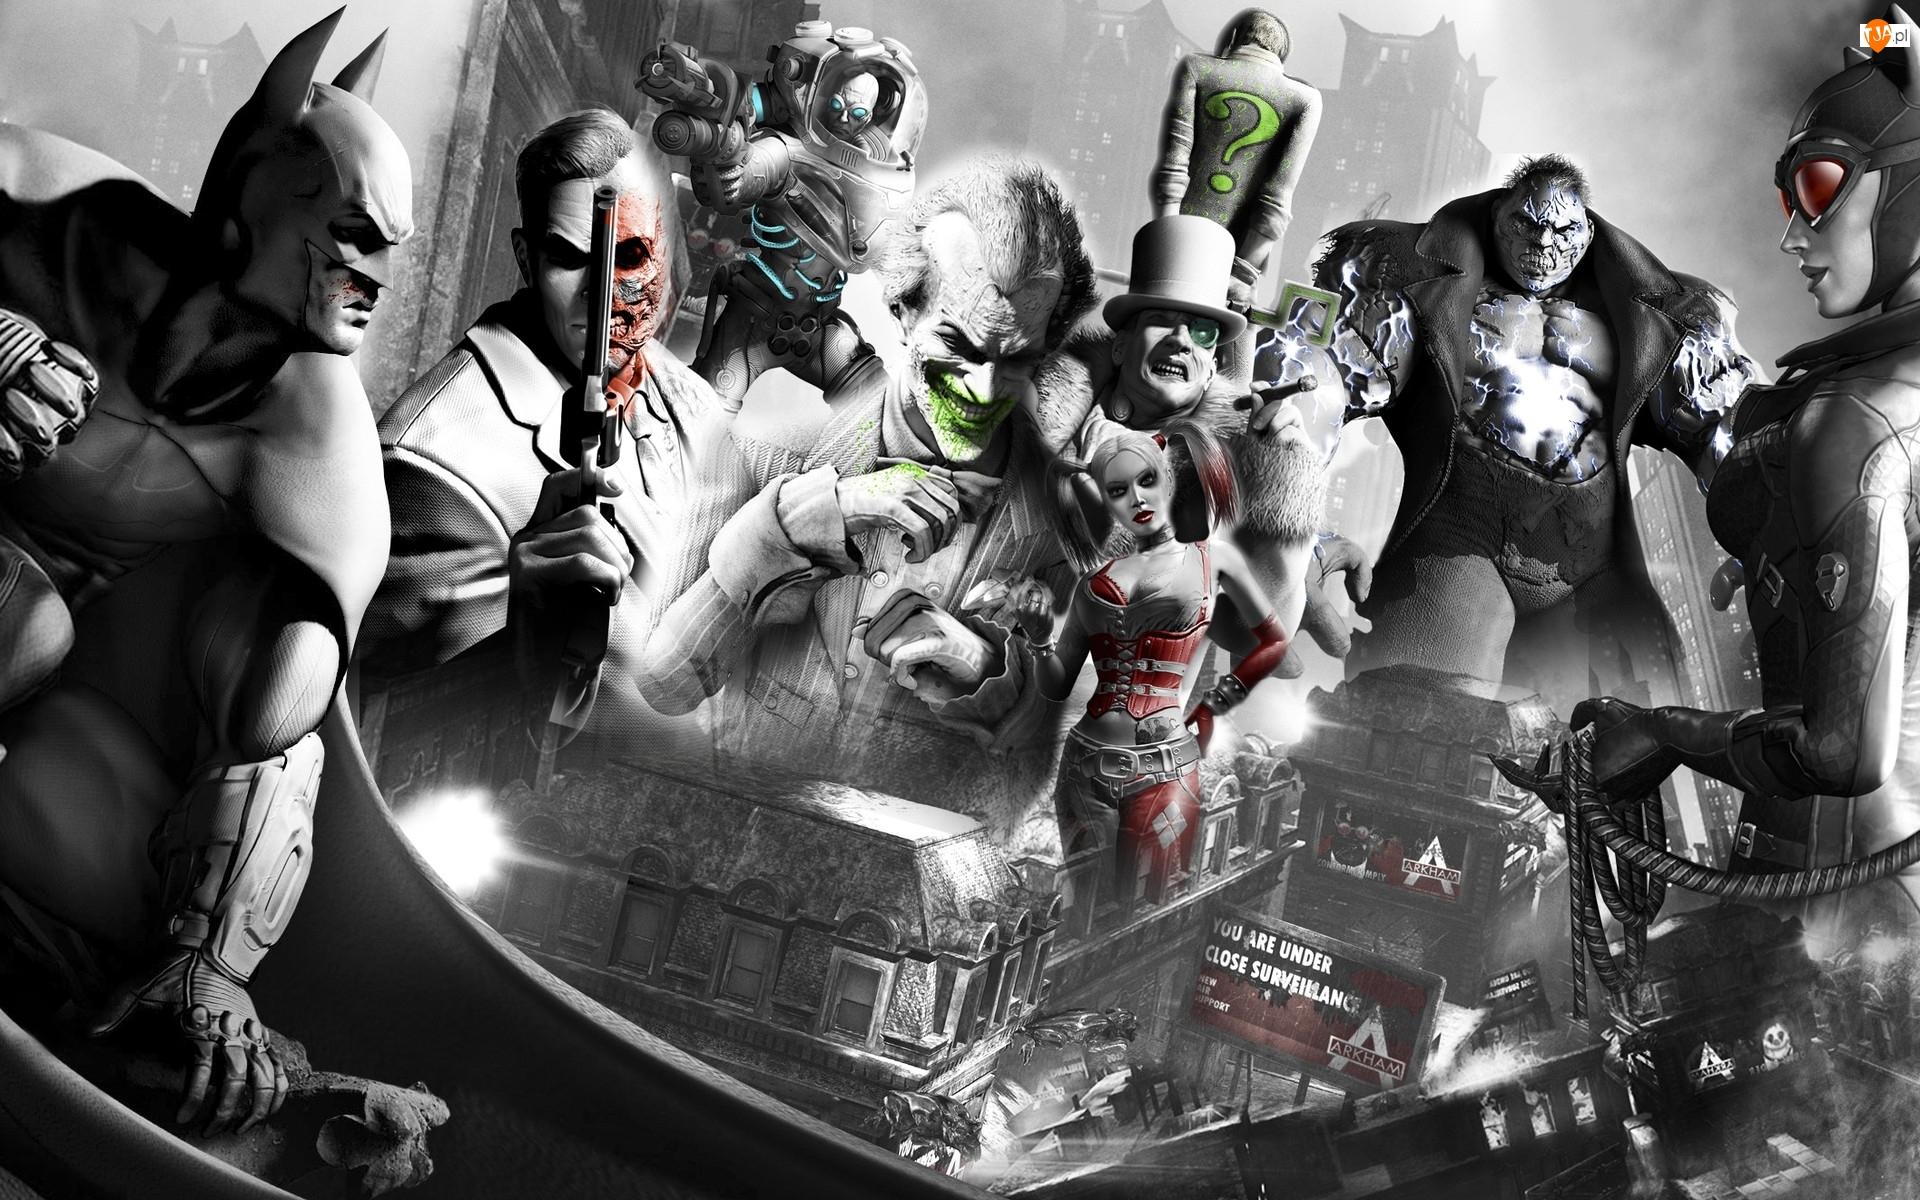 Batman, Joker, Arkham city, Catwoman